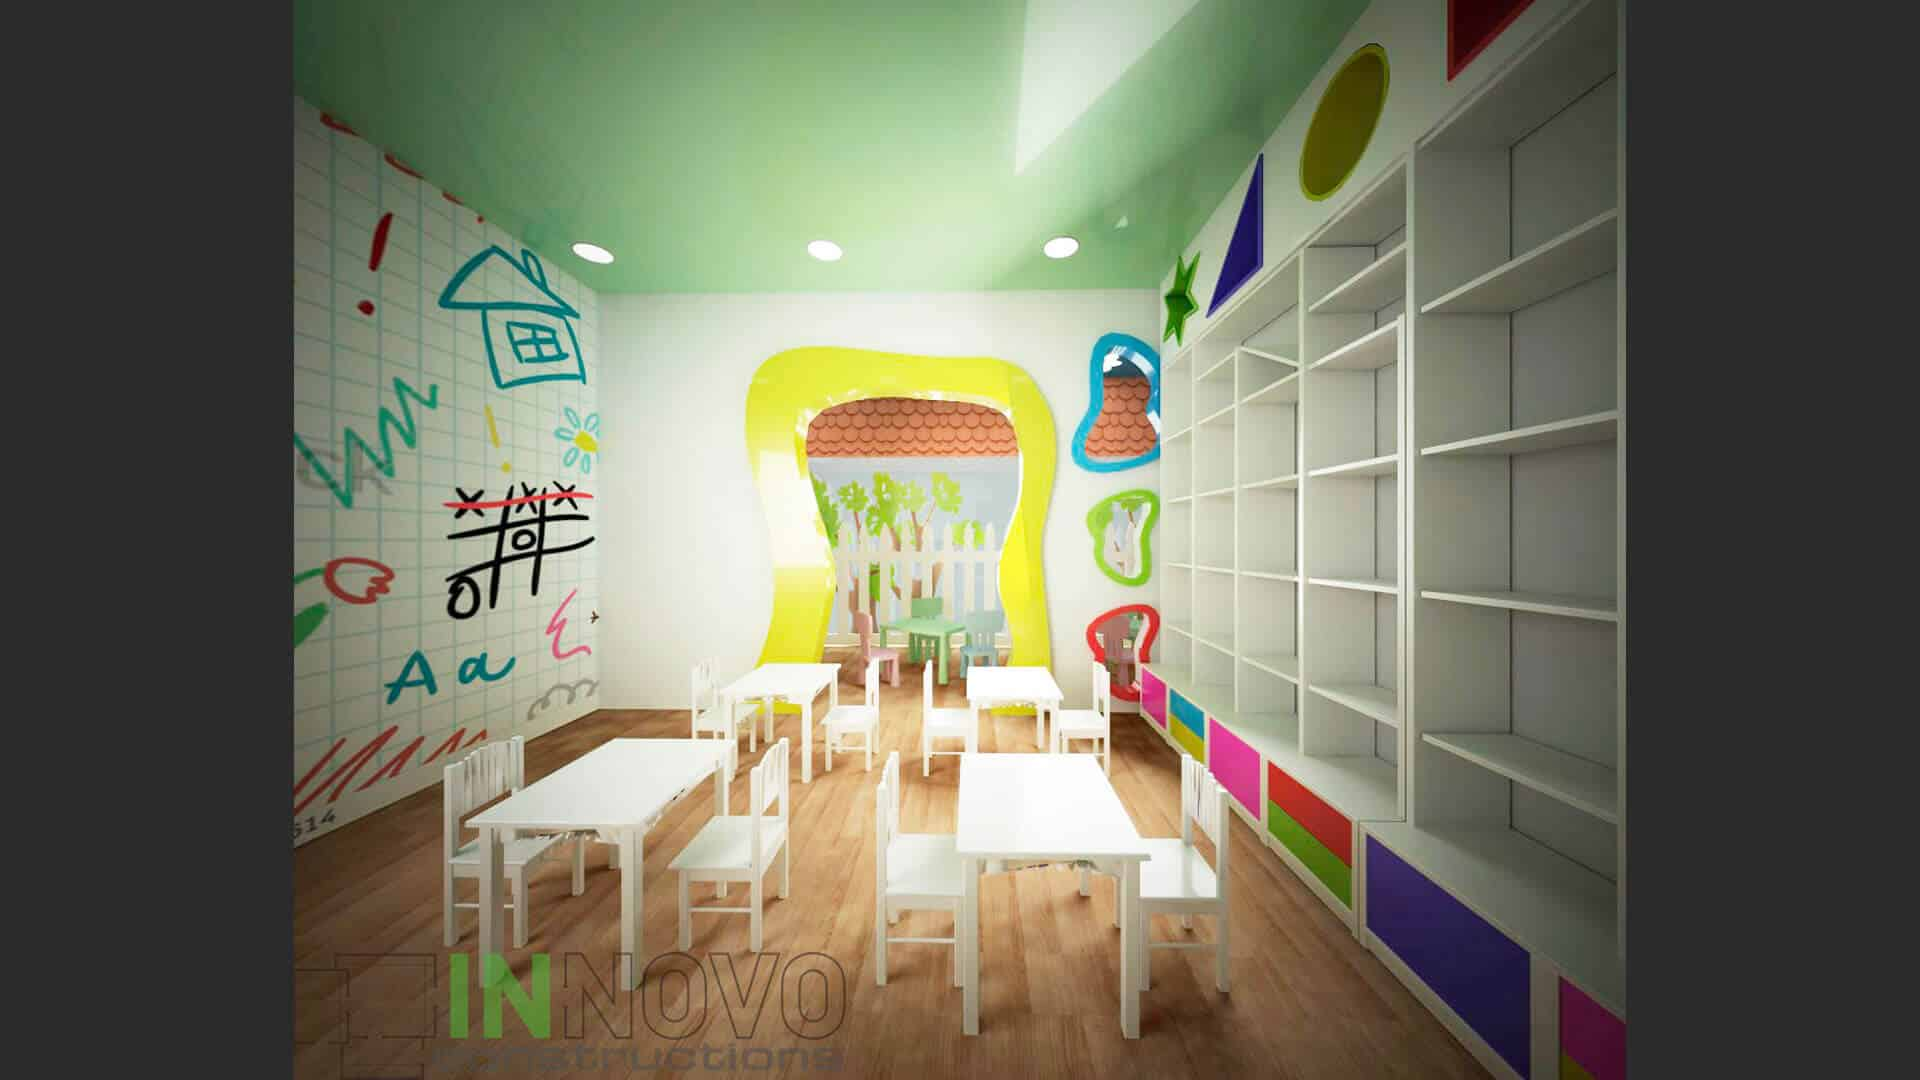 anakainisi-paidikou-stathmou-nursery-renovation-paidikos-stathmos-glyfada-2182-9